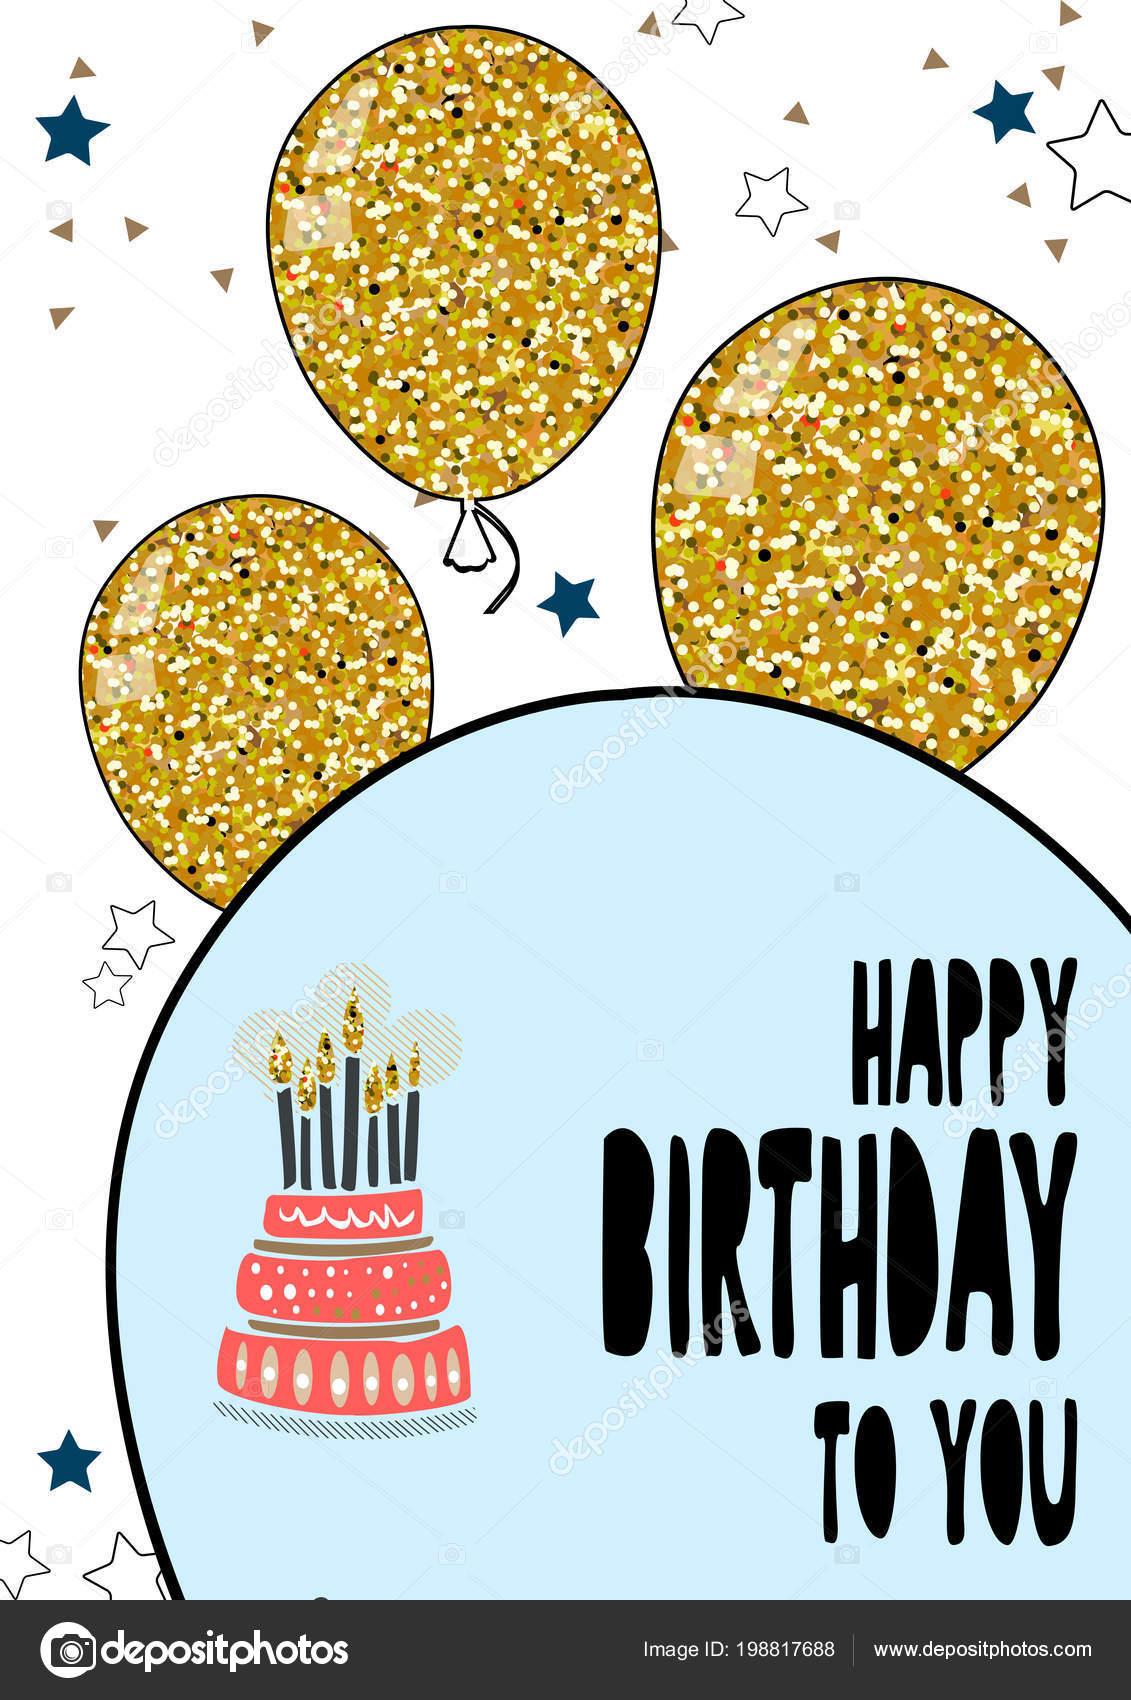 Happy Birthday greeting hand drawn modern card background. 8